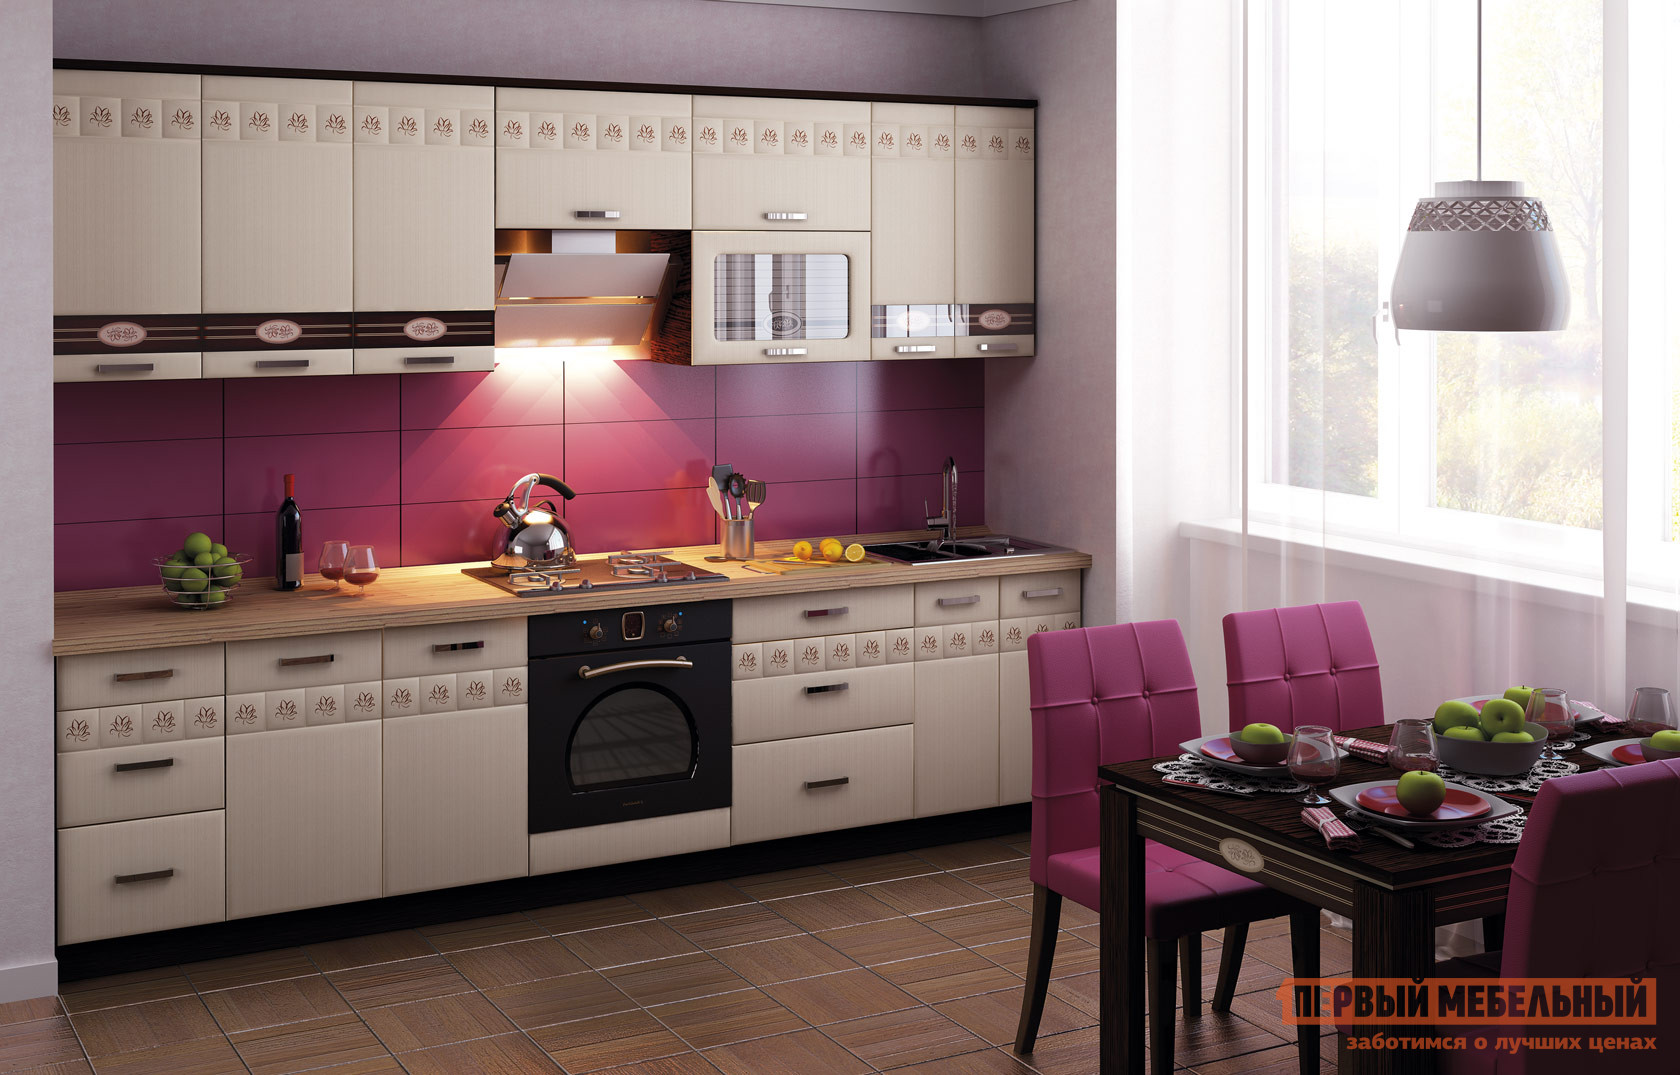 Кухонный гарнитур Витра Аврора 300-2 кухонный гарнитур витра глория 3 к3